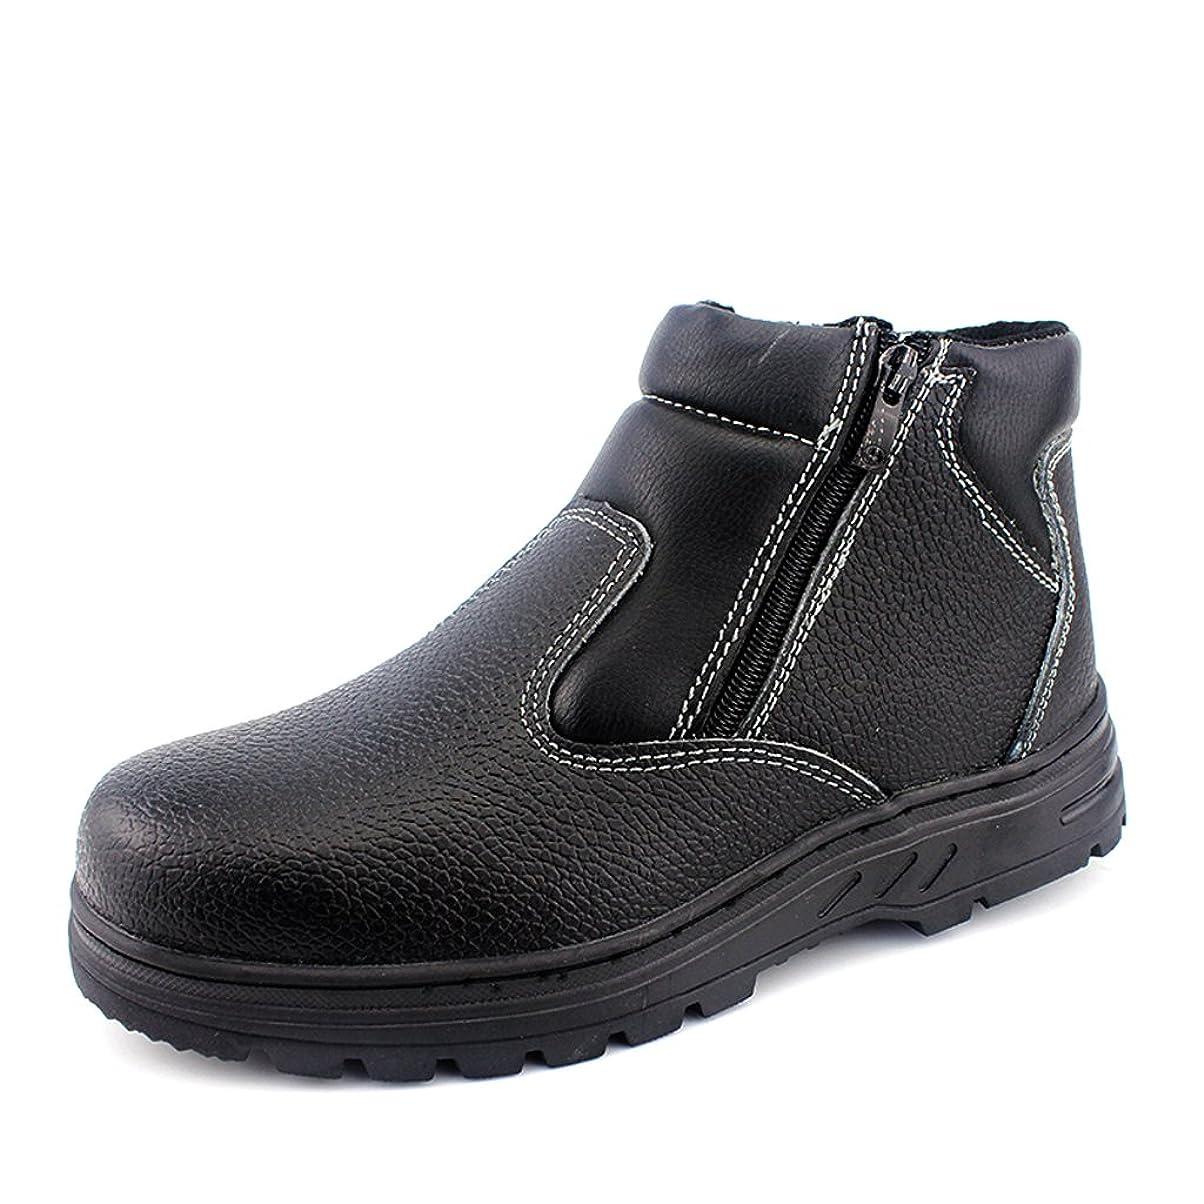 [Placck安全] 安全靴 ハイカット 23cm-27.5cm 短靴 耐油 防護 黒色 防滑 防寒